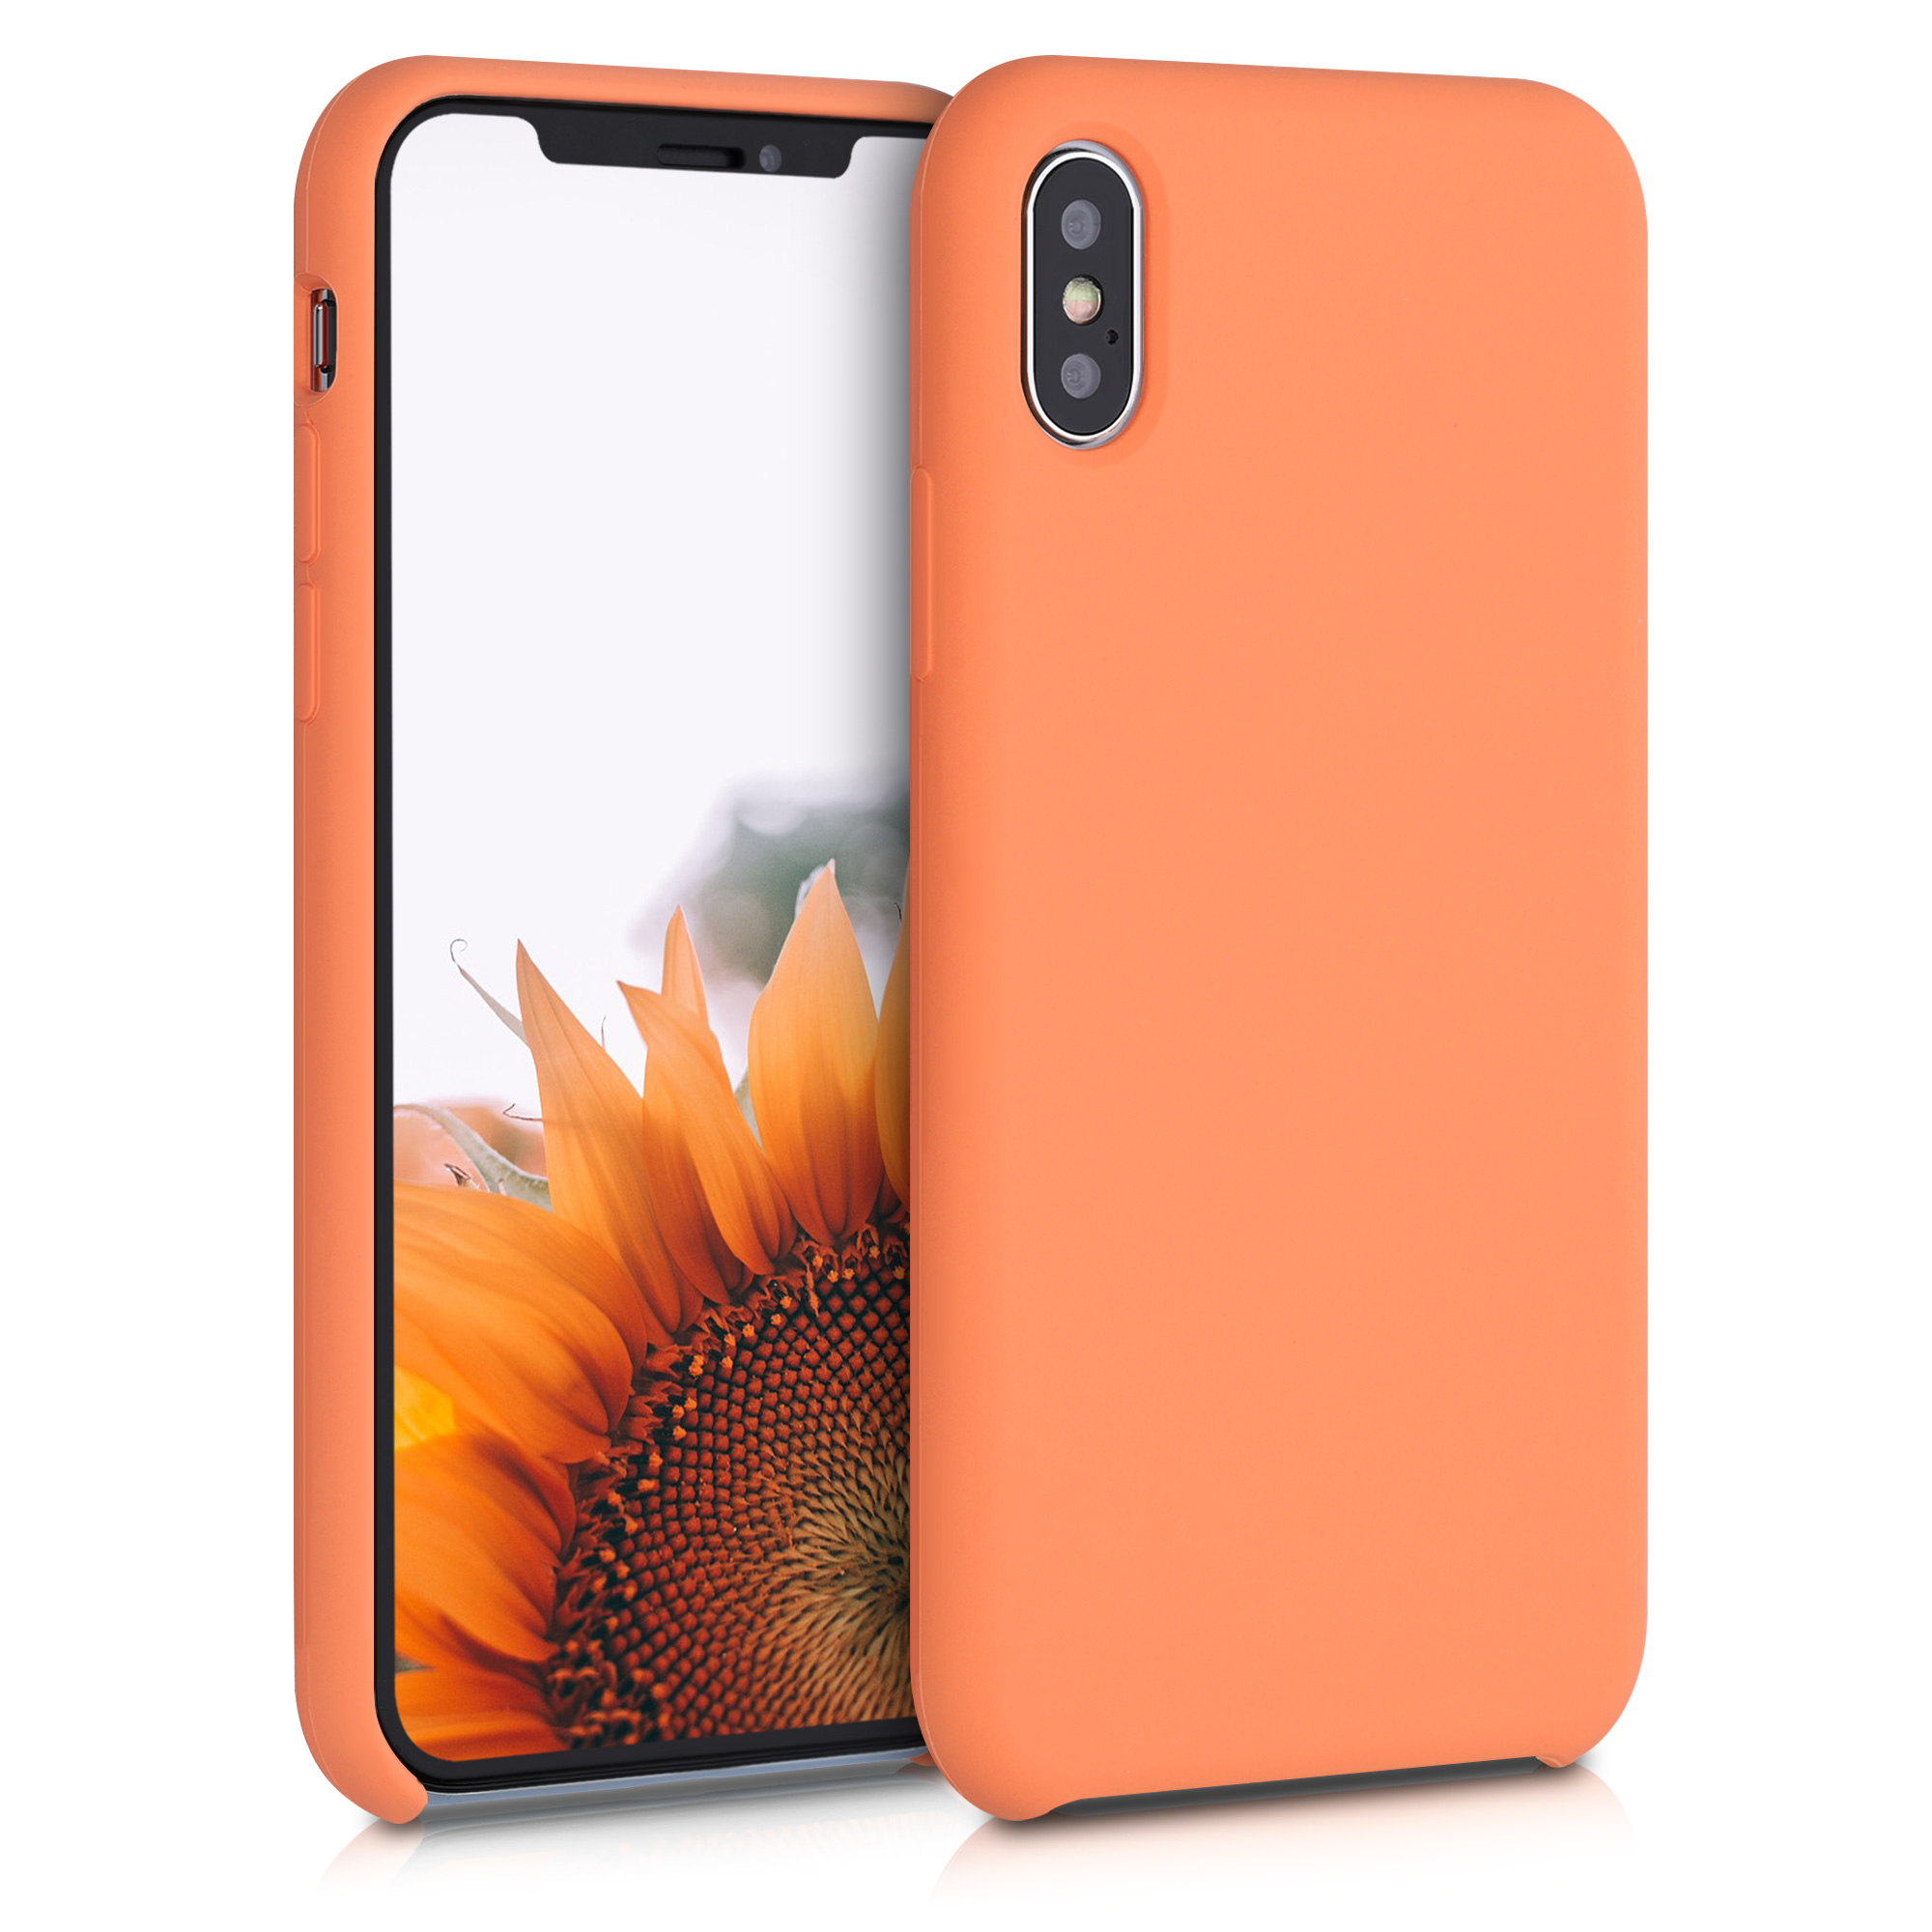 Kvalitní silikonové TPU pouzdro pro Apple iPhone XS - Sunrise Orange